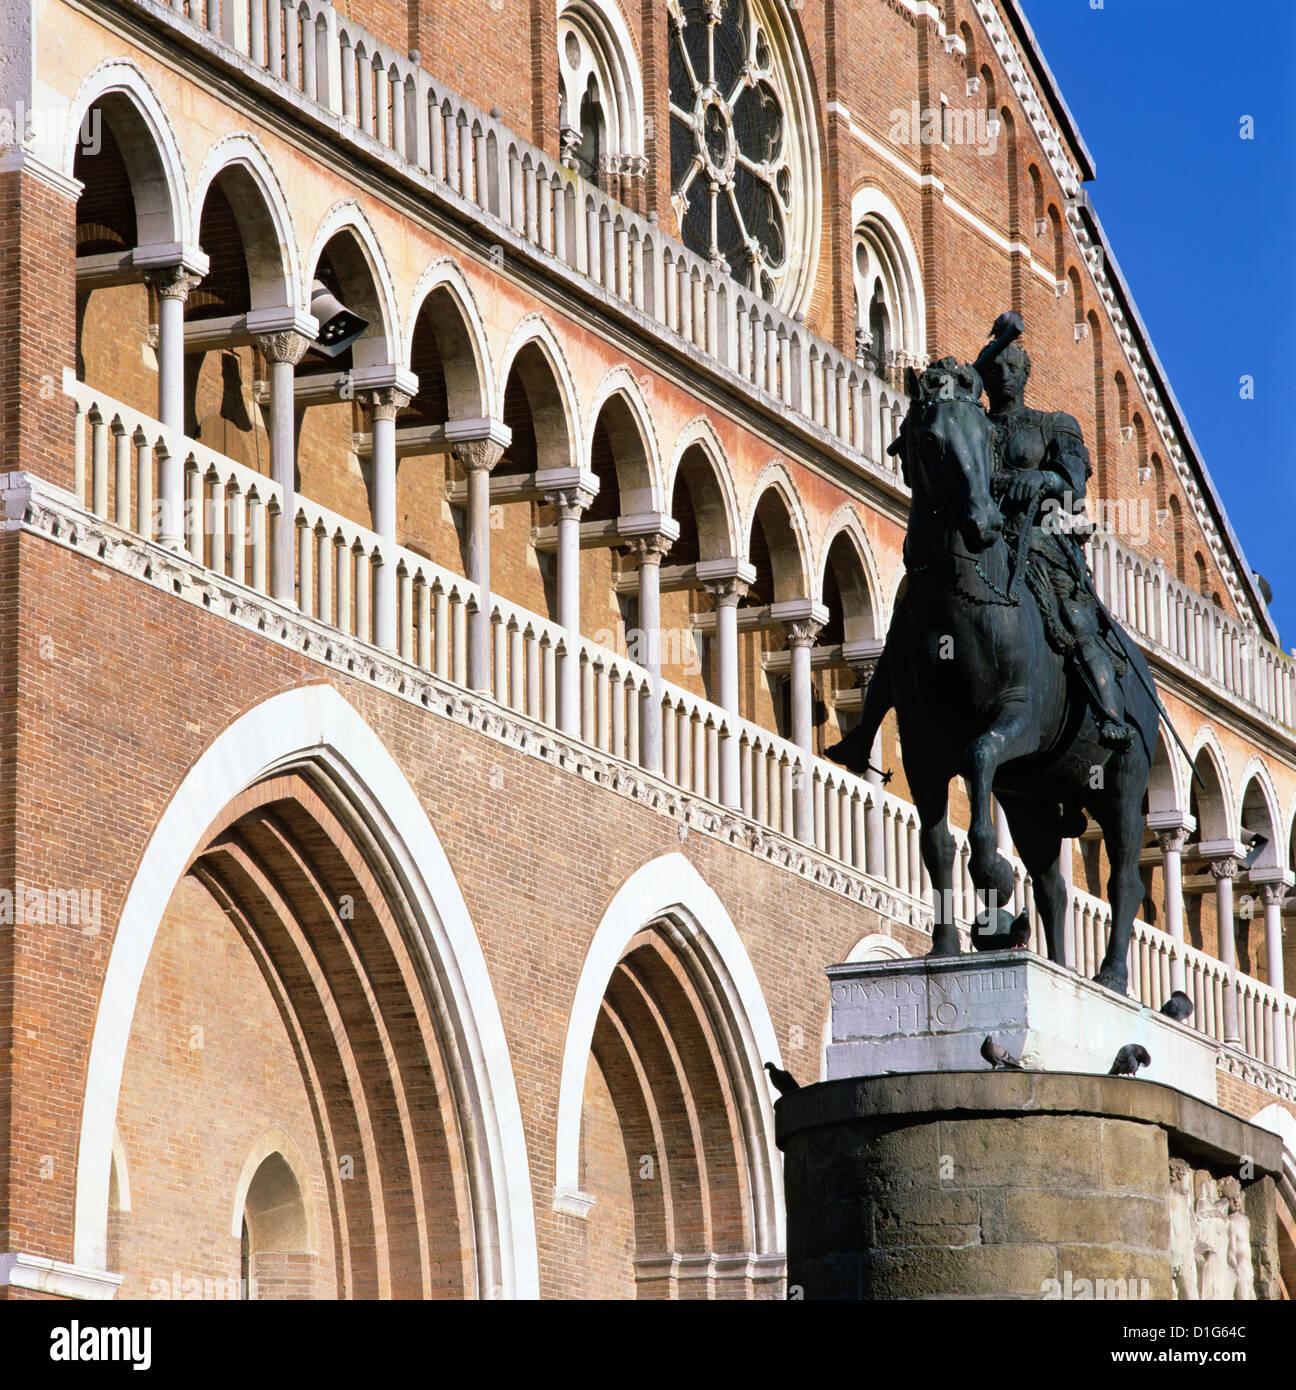 Fassade des Il Santo (Basilica di San Antonio) mit Donatello Denkmal Gattamelata, Padua, Venetien, Italien, Europa Stockbild